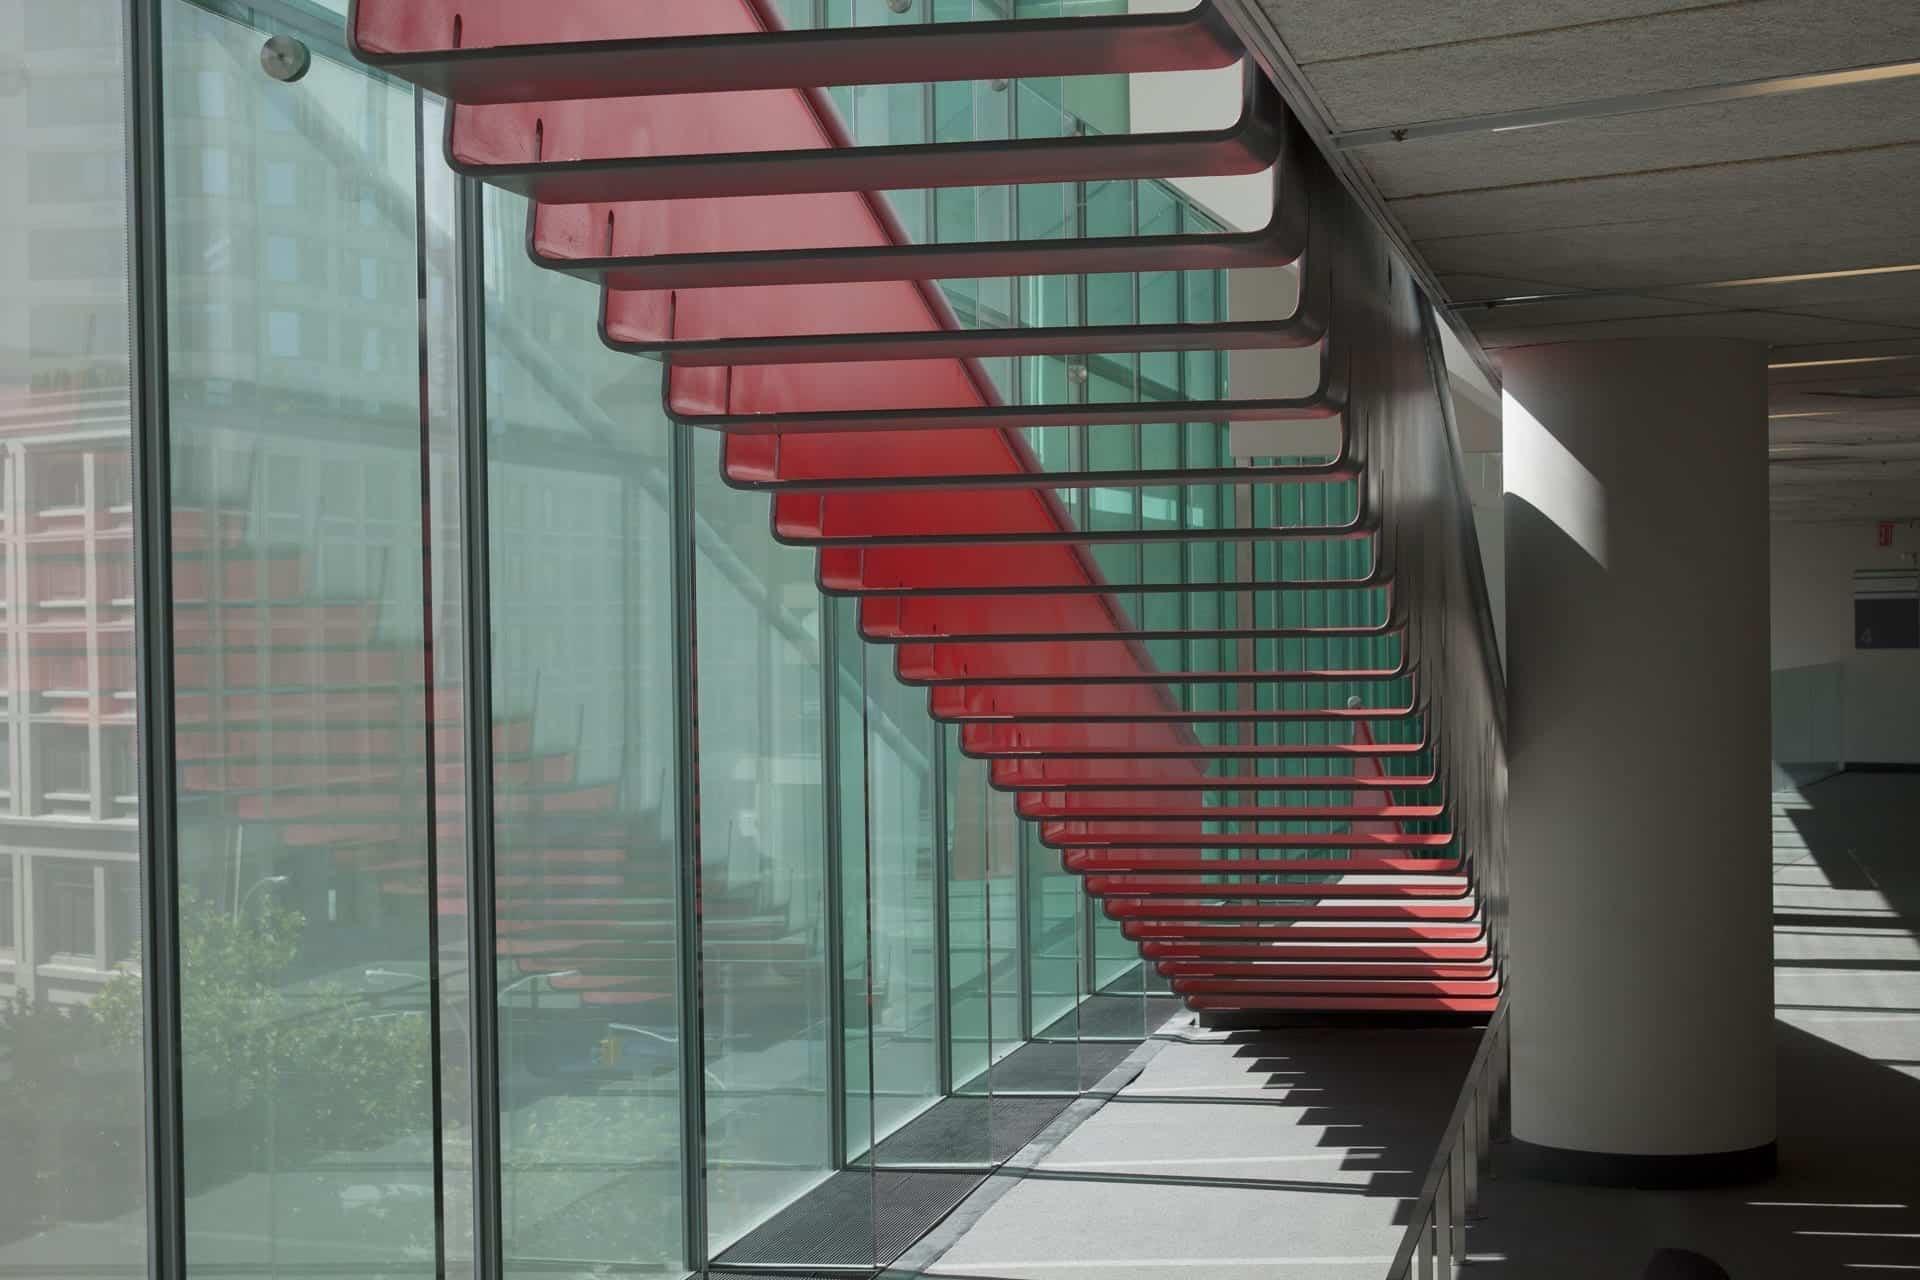 Juilliard Staircase designed by Diller Scofidio + Renfro.